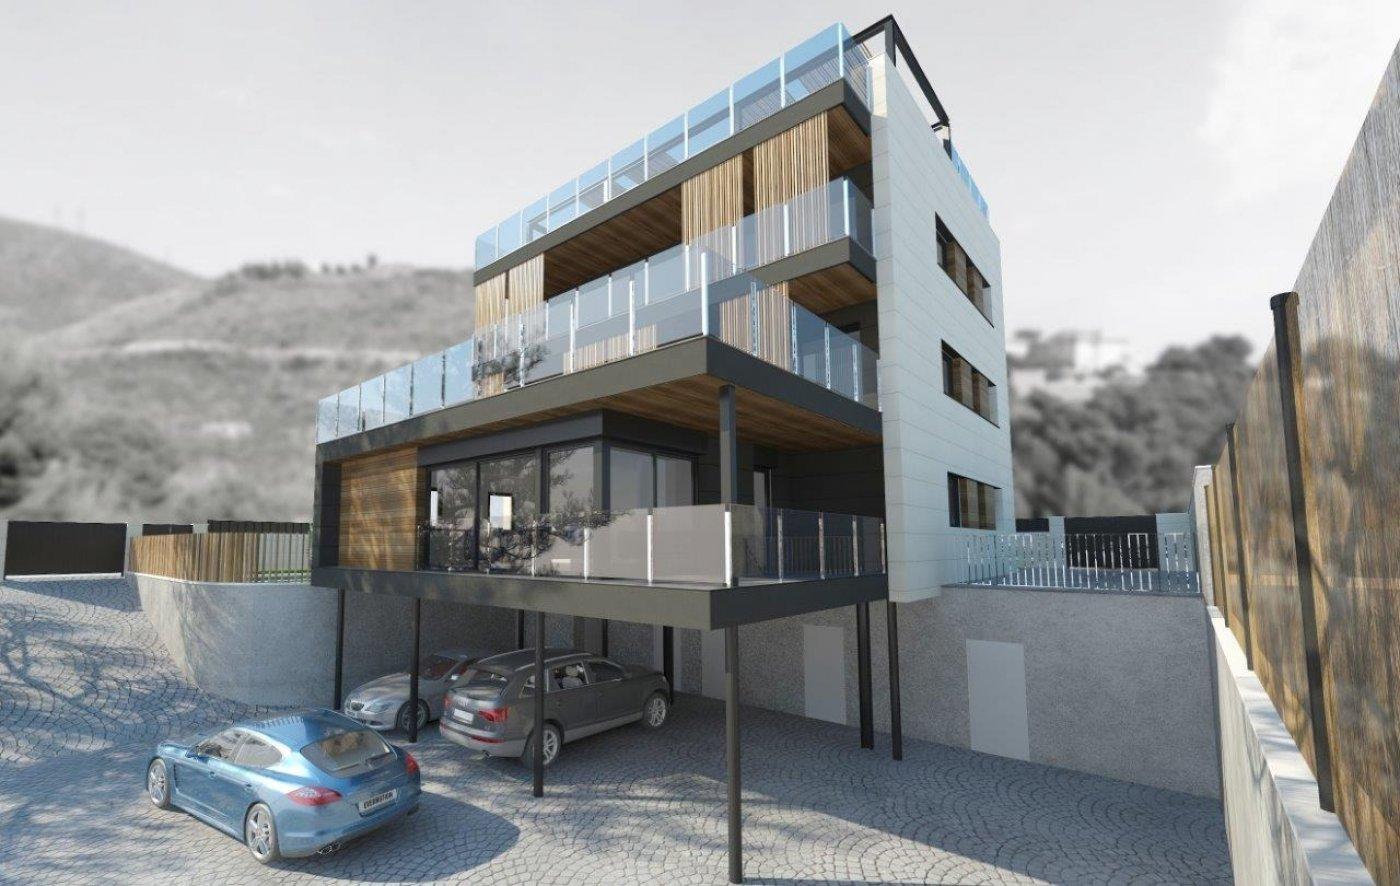 Etagenwohnung  Castelldefels ,montemar. Obra nueva en montemar alto